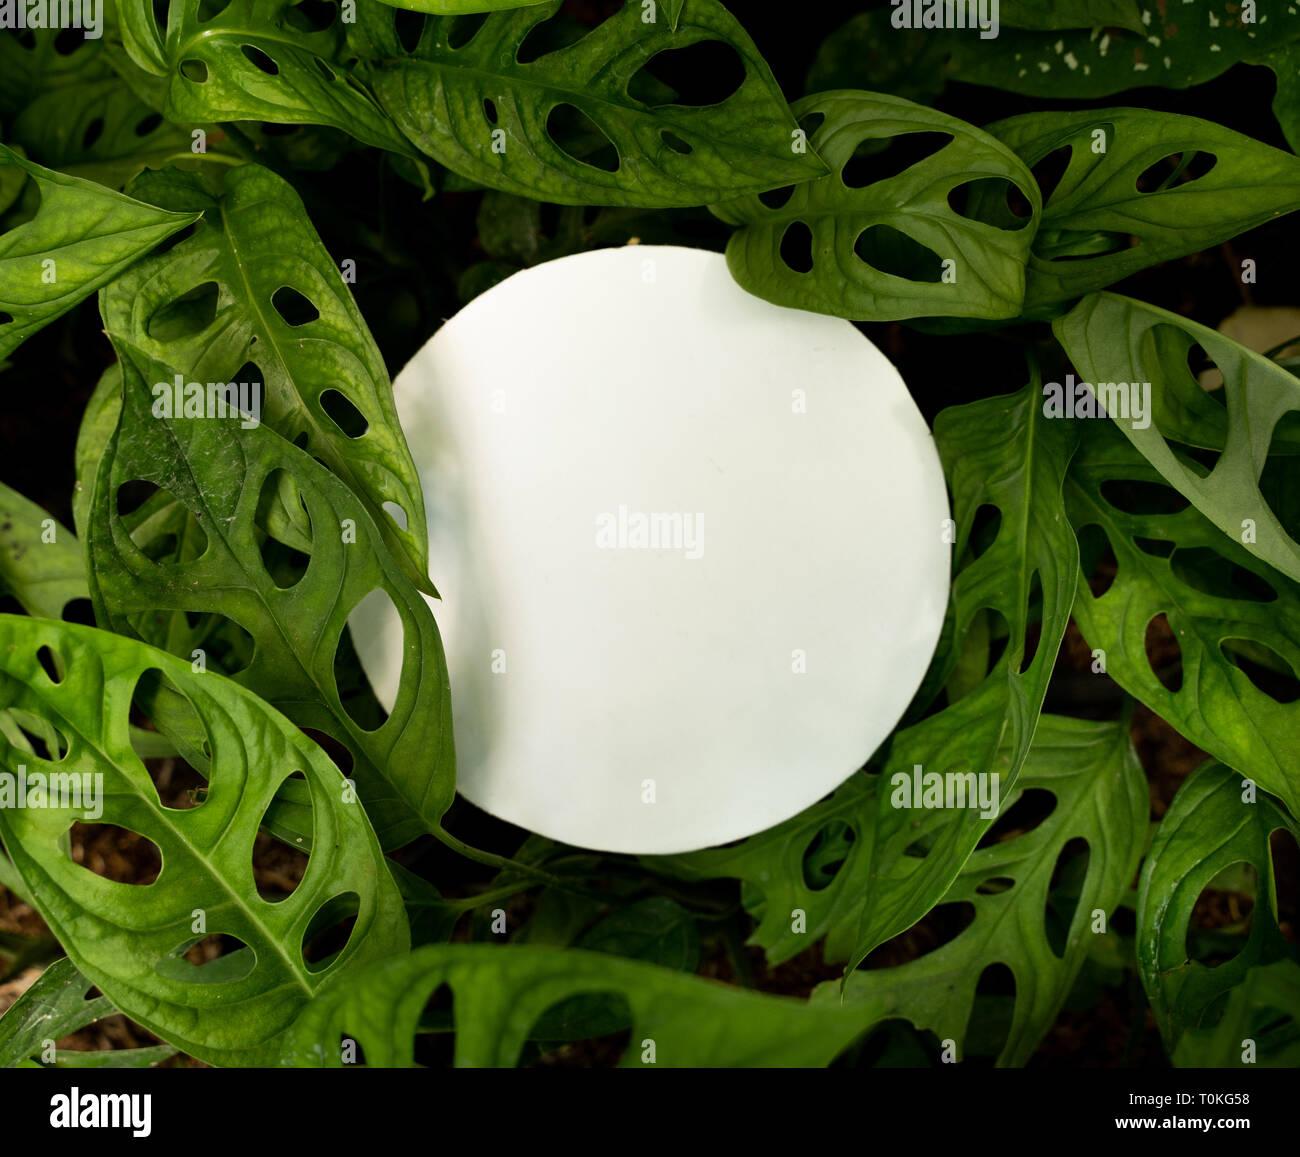 Monstera Adansonii or swiss cheese plant - Stock Image